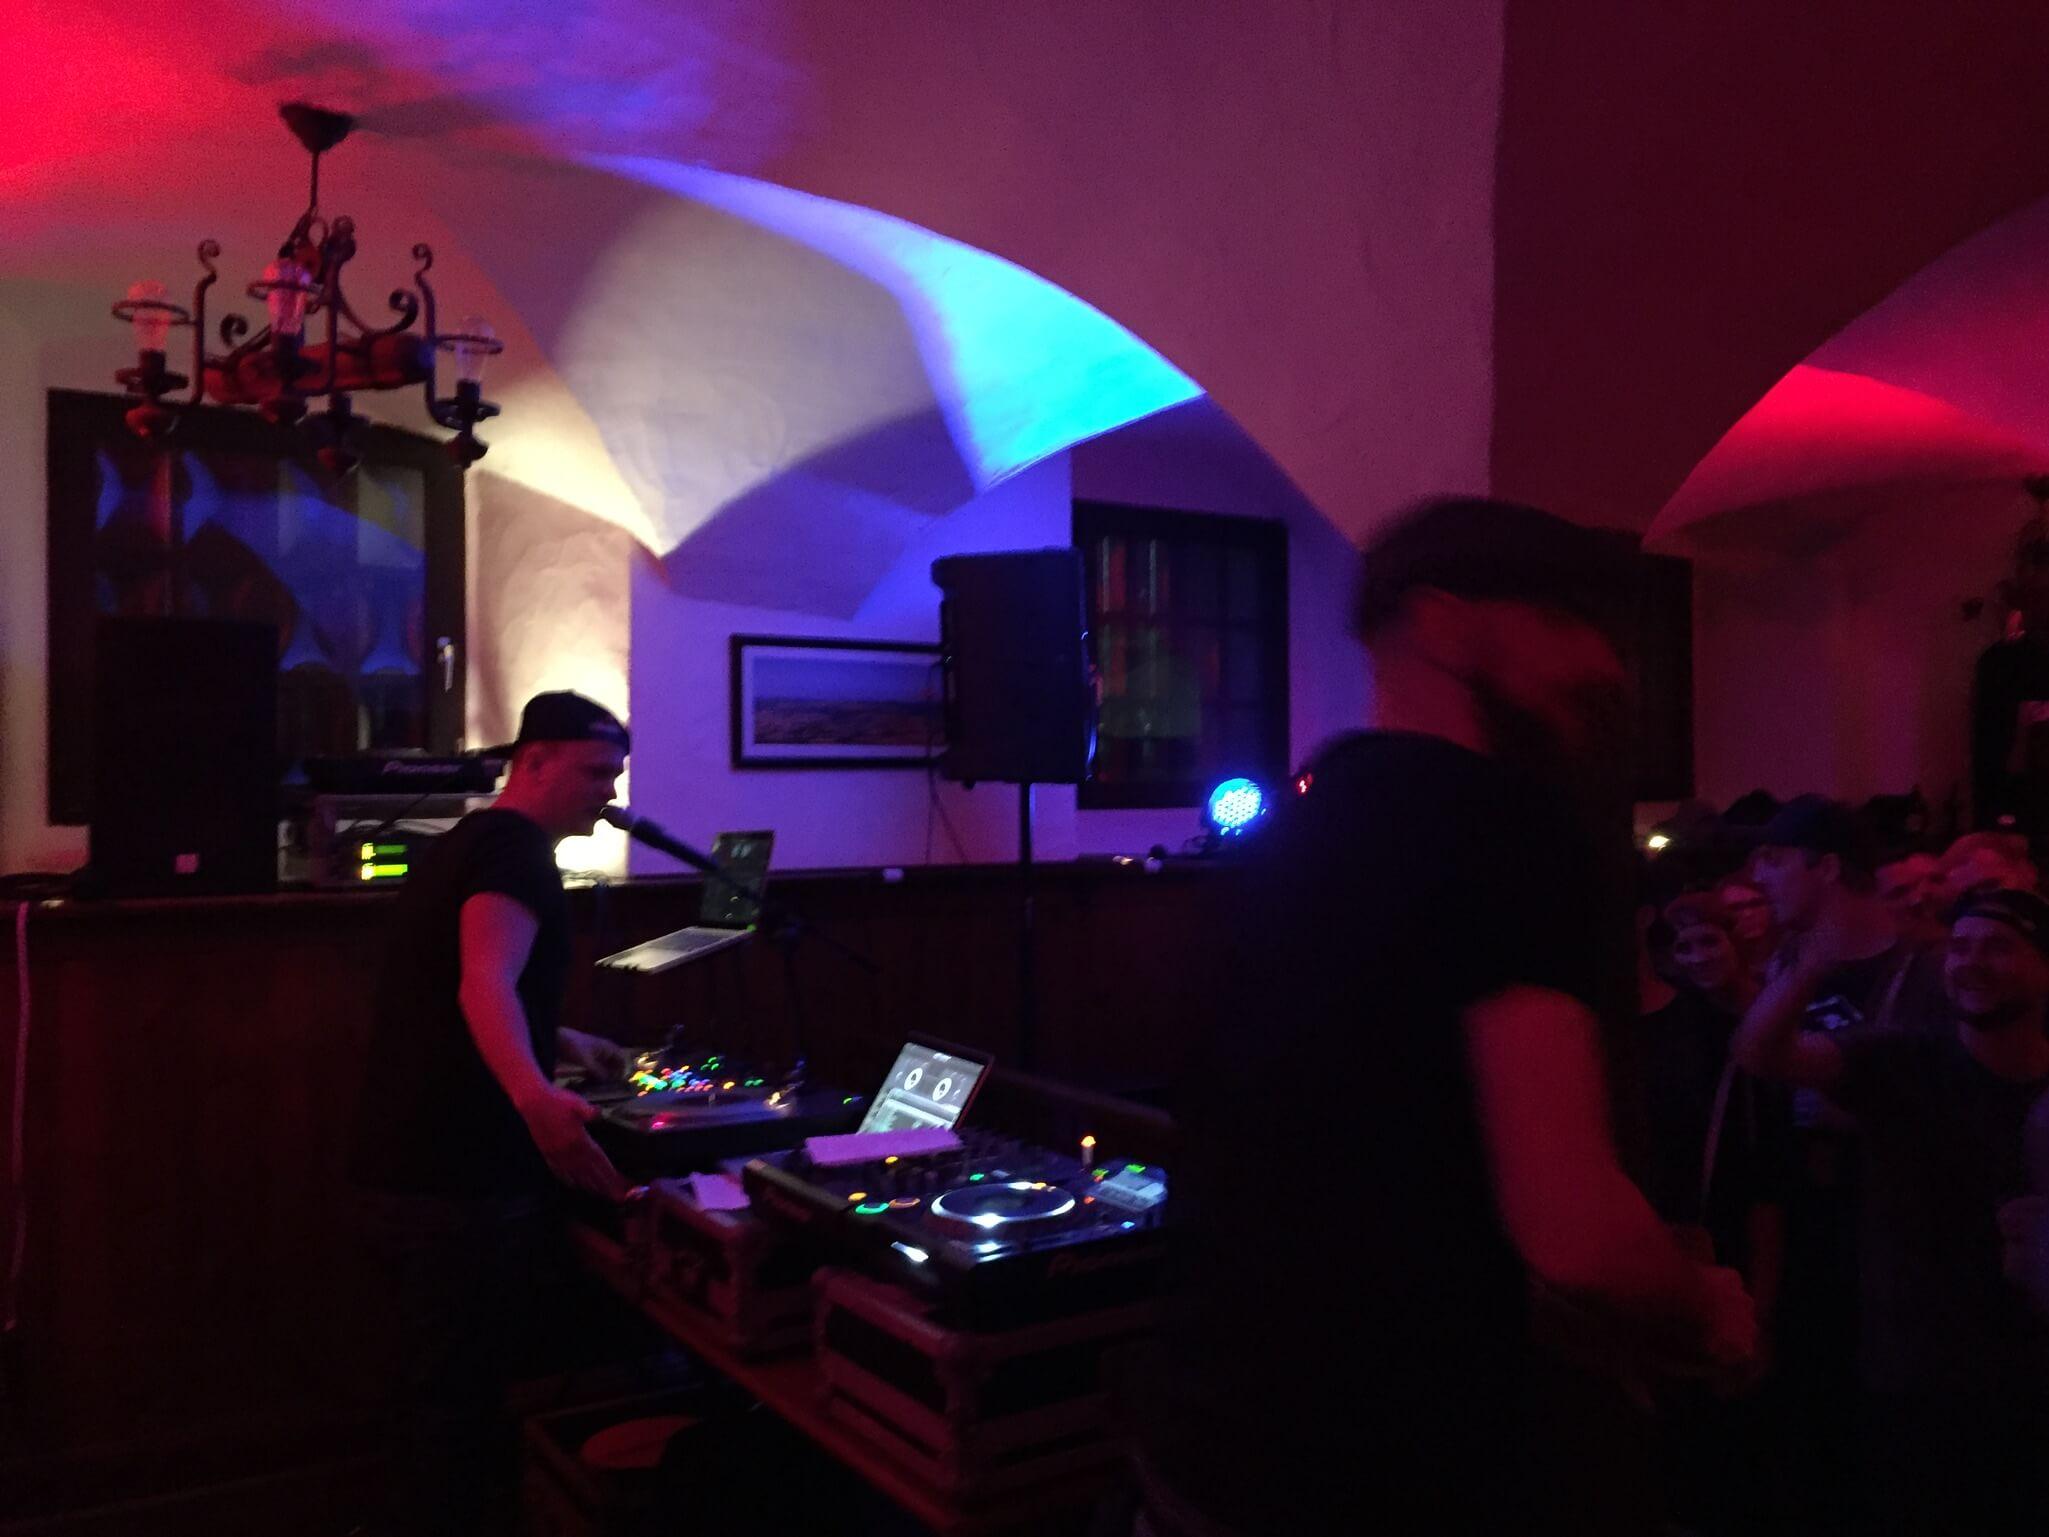 Gramoe und Som. Company Slow. Frankenburger. Live Hip Hop. Bratwurst Rap. Coburg.